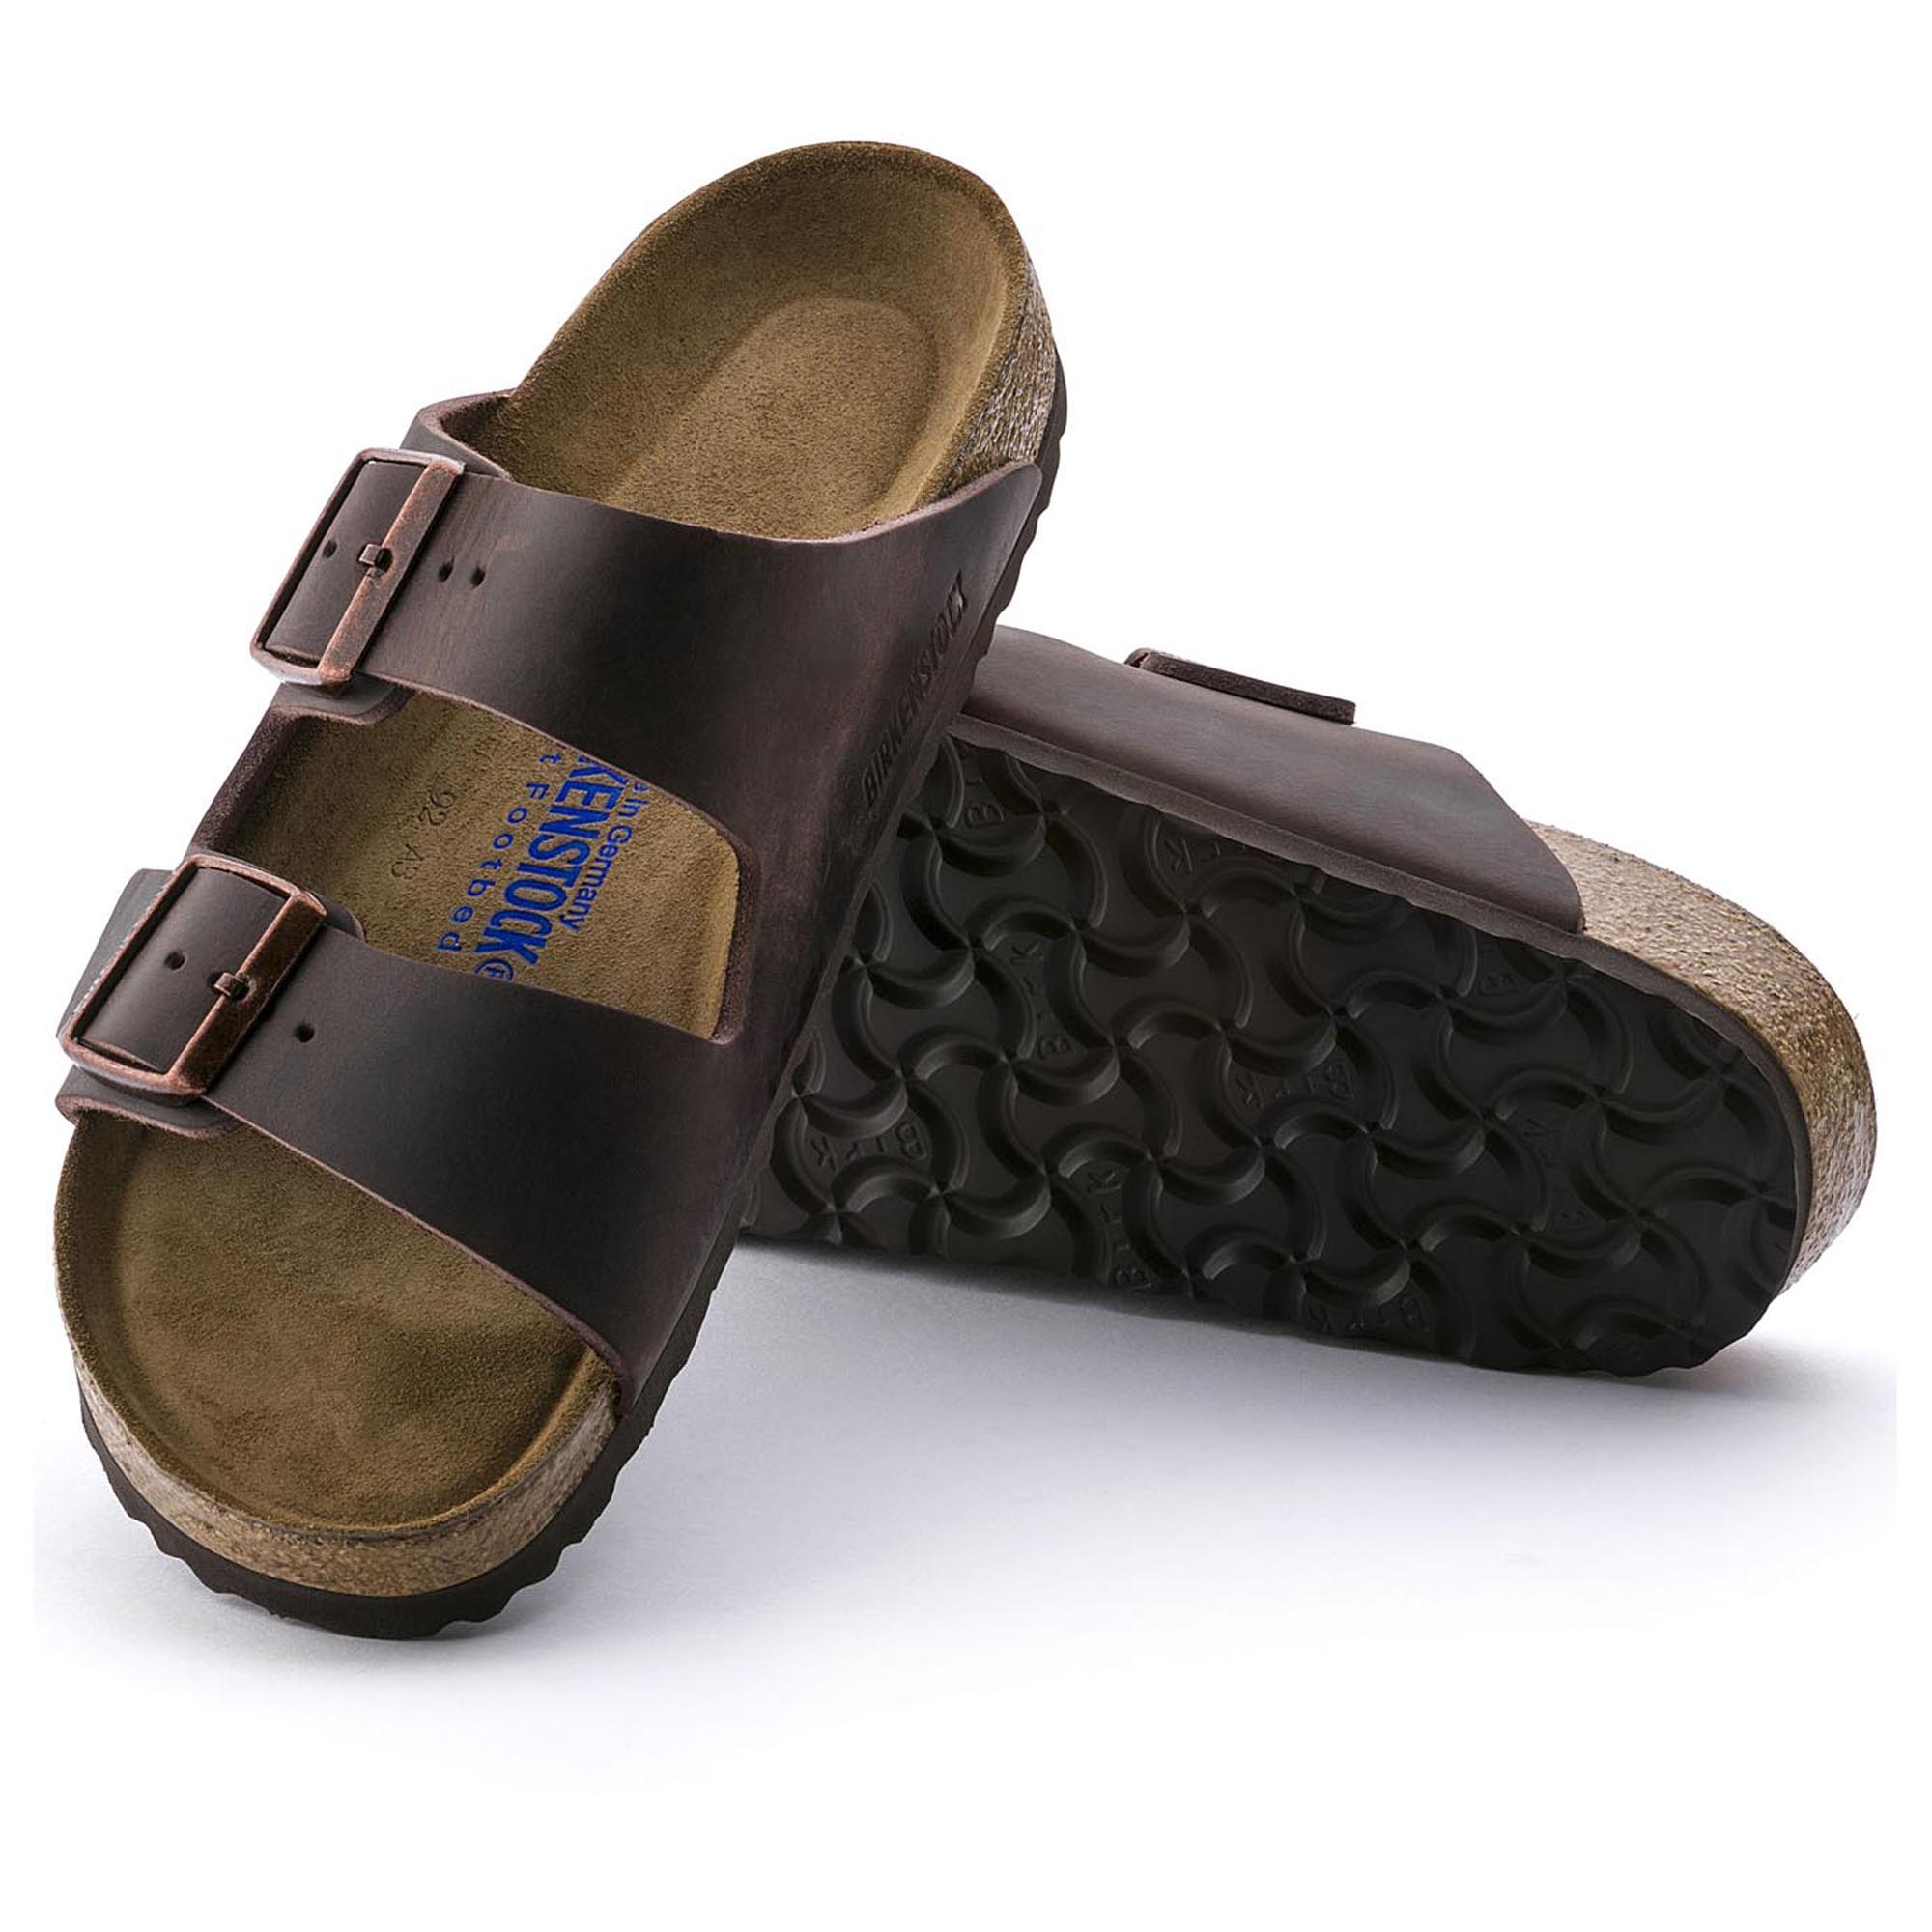 54ecff823ac Arizona Oiled Leather Habana | shop online at BIRKENSTOCK